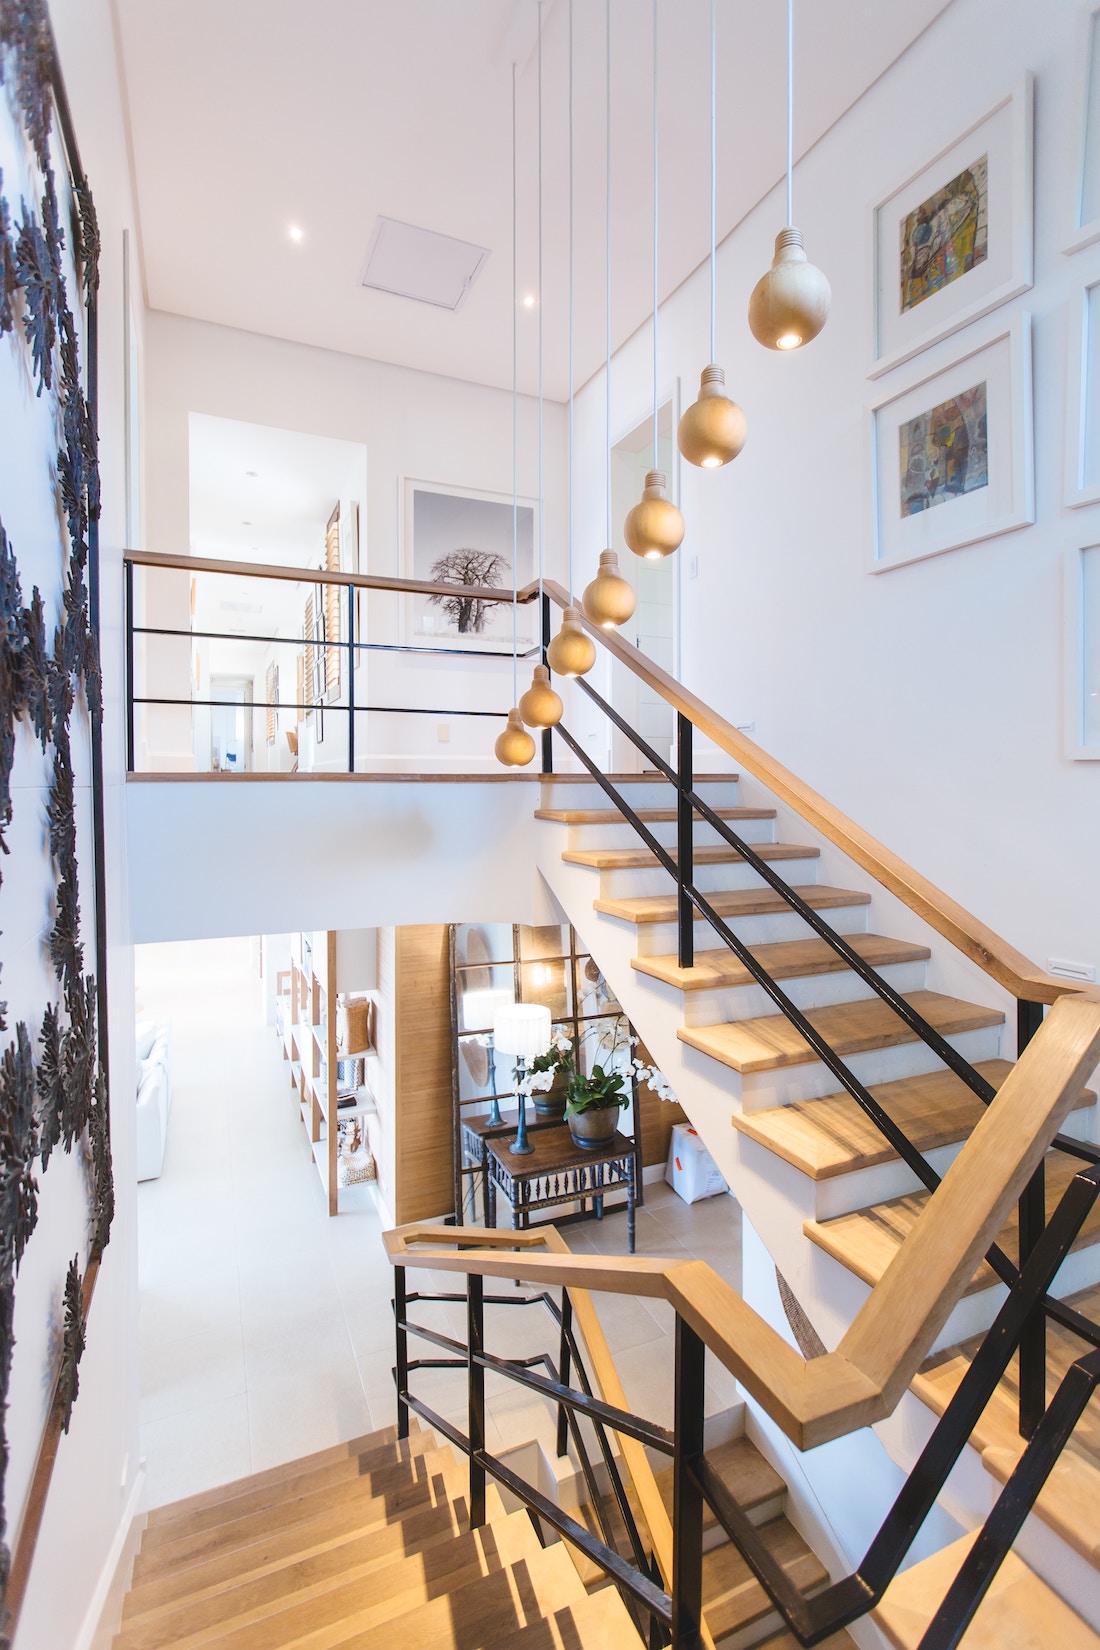 Home Improvement Project Ideas